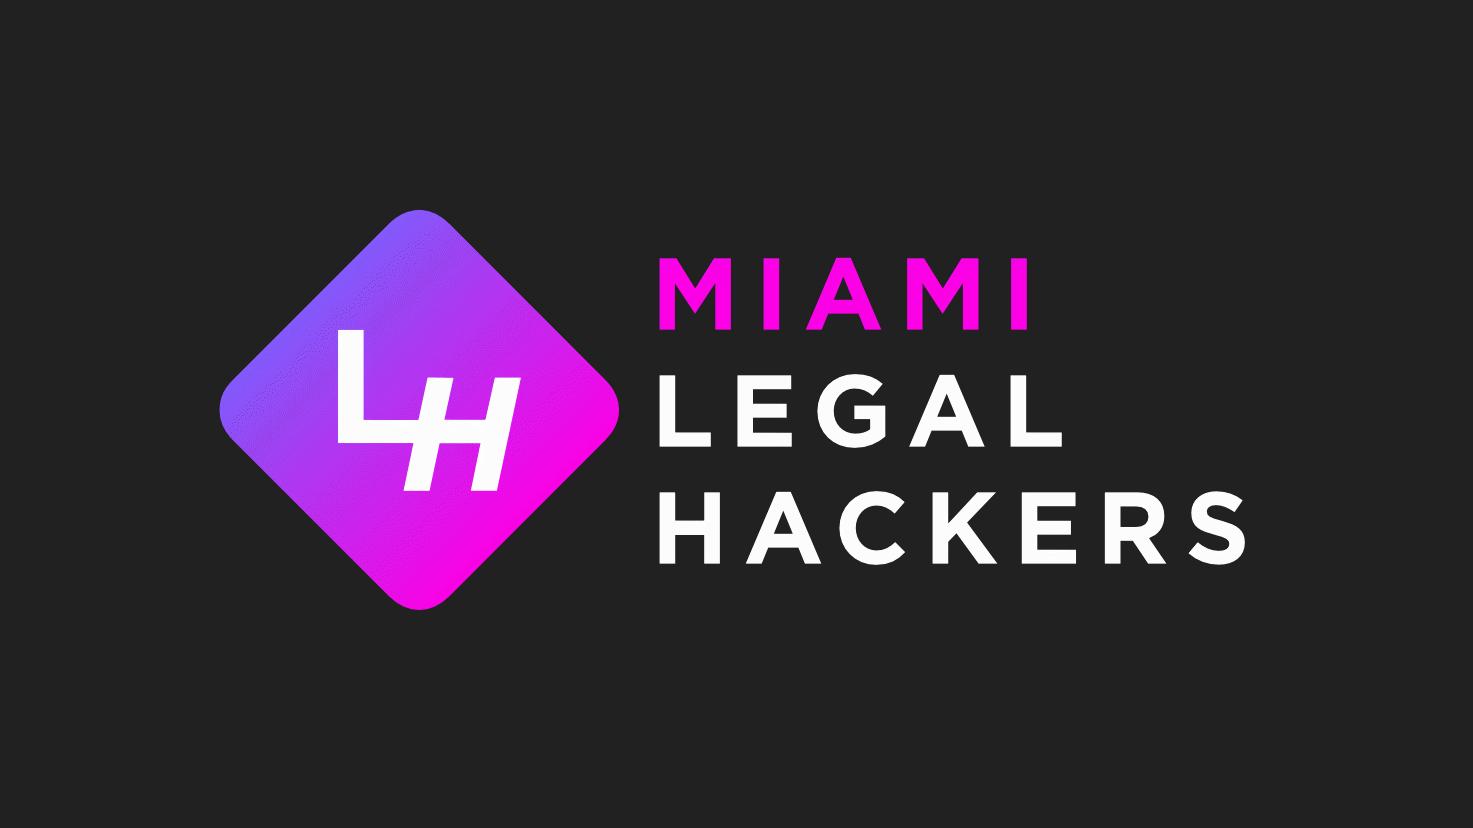 Miami Legal Hackers